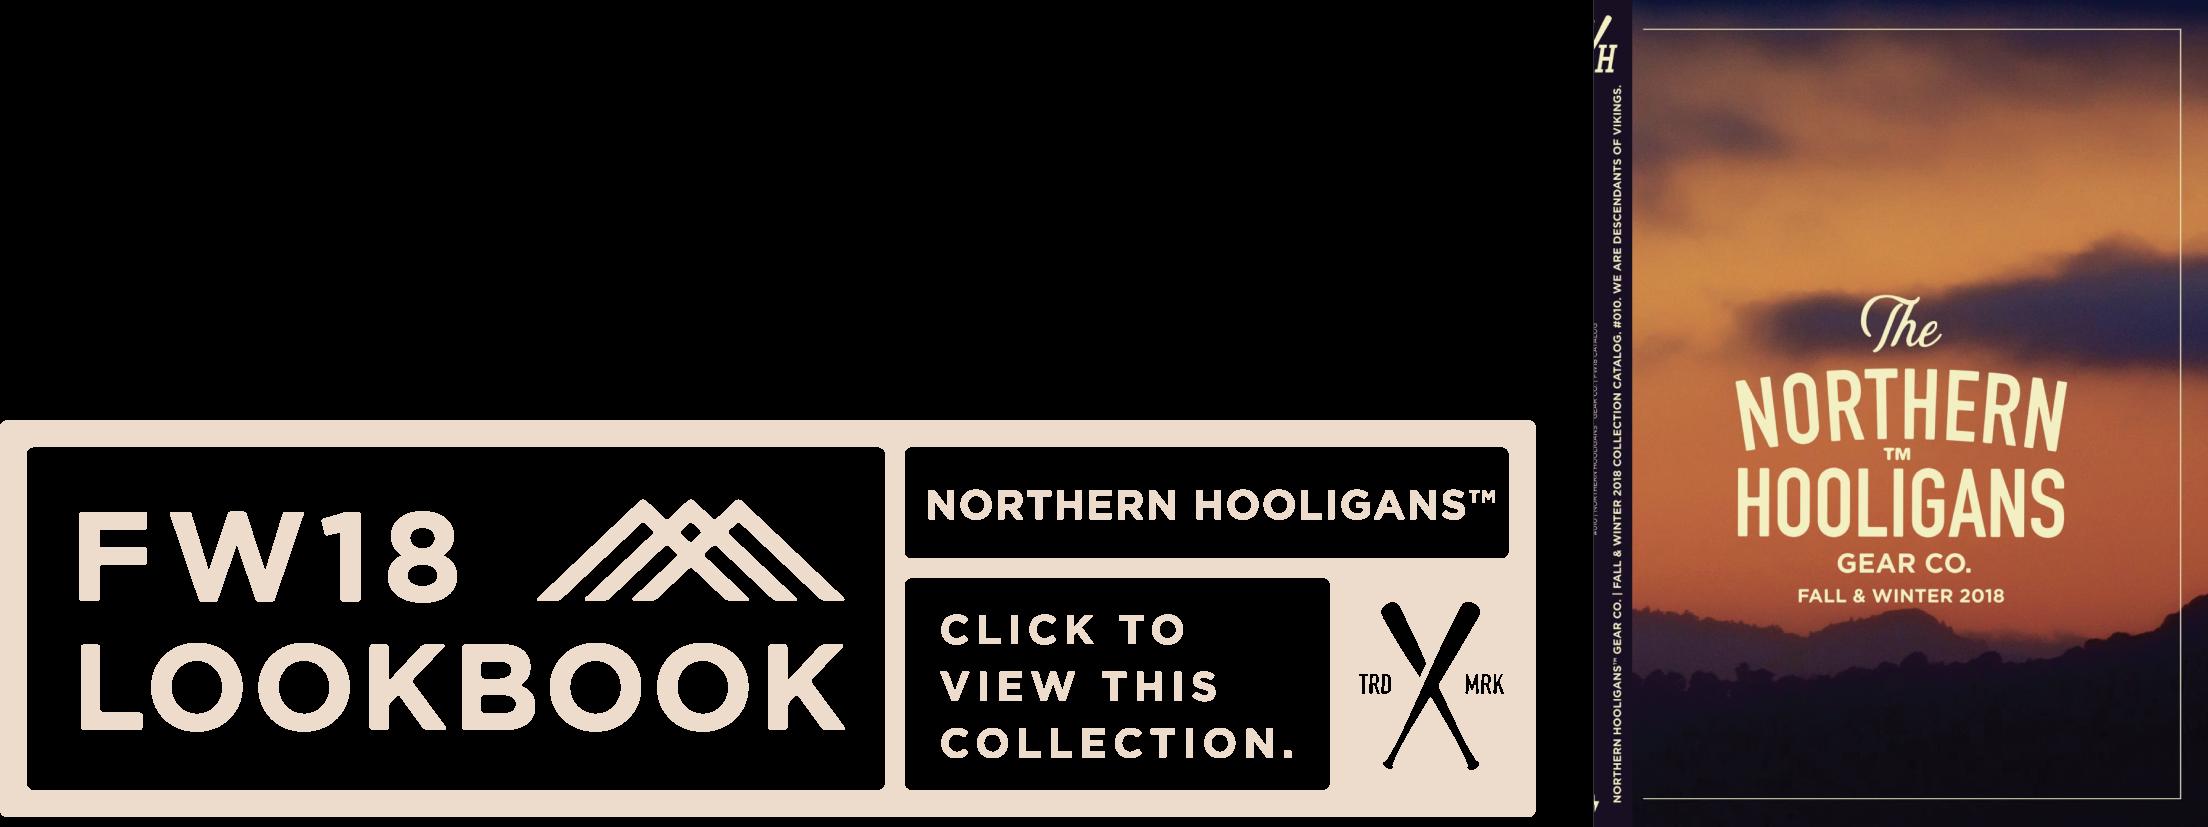 LOOKBOOKS_FW18.png